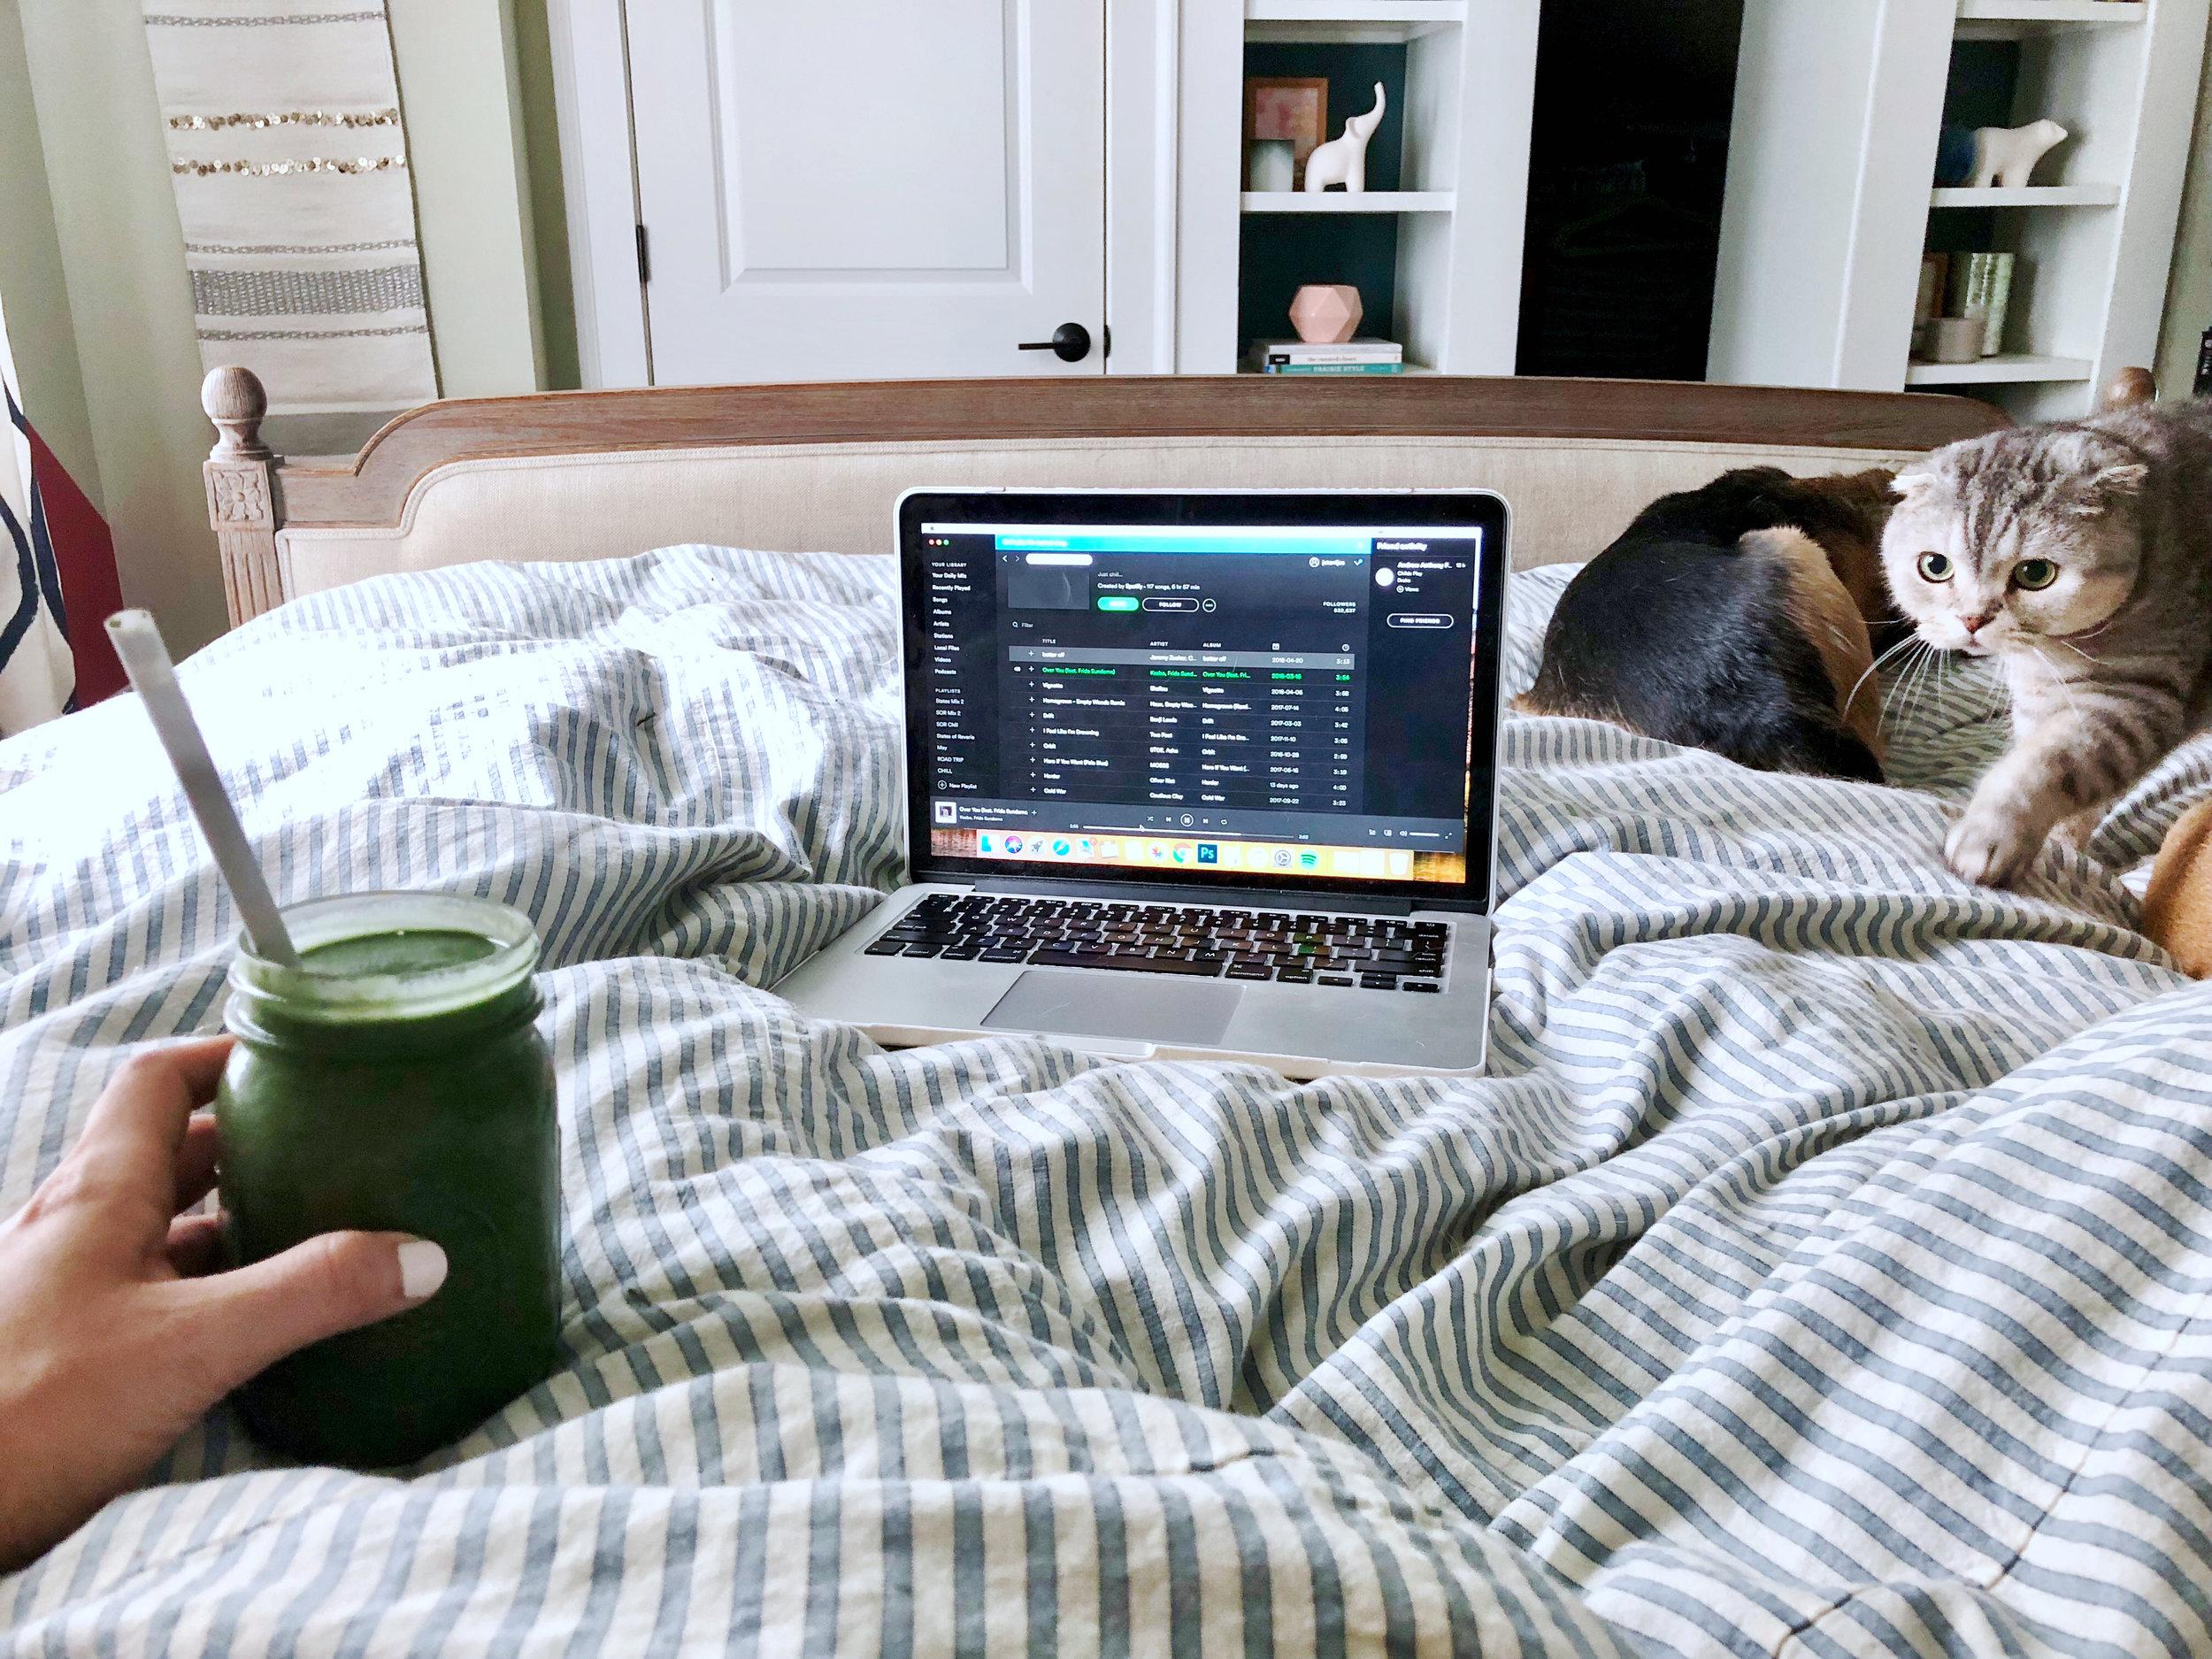 jo-torrijos-states-of-reverie-quiet-music-morning.jpeg